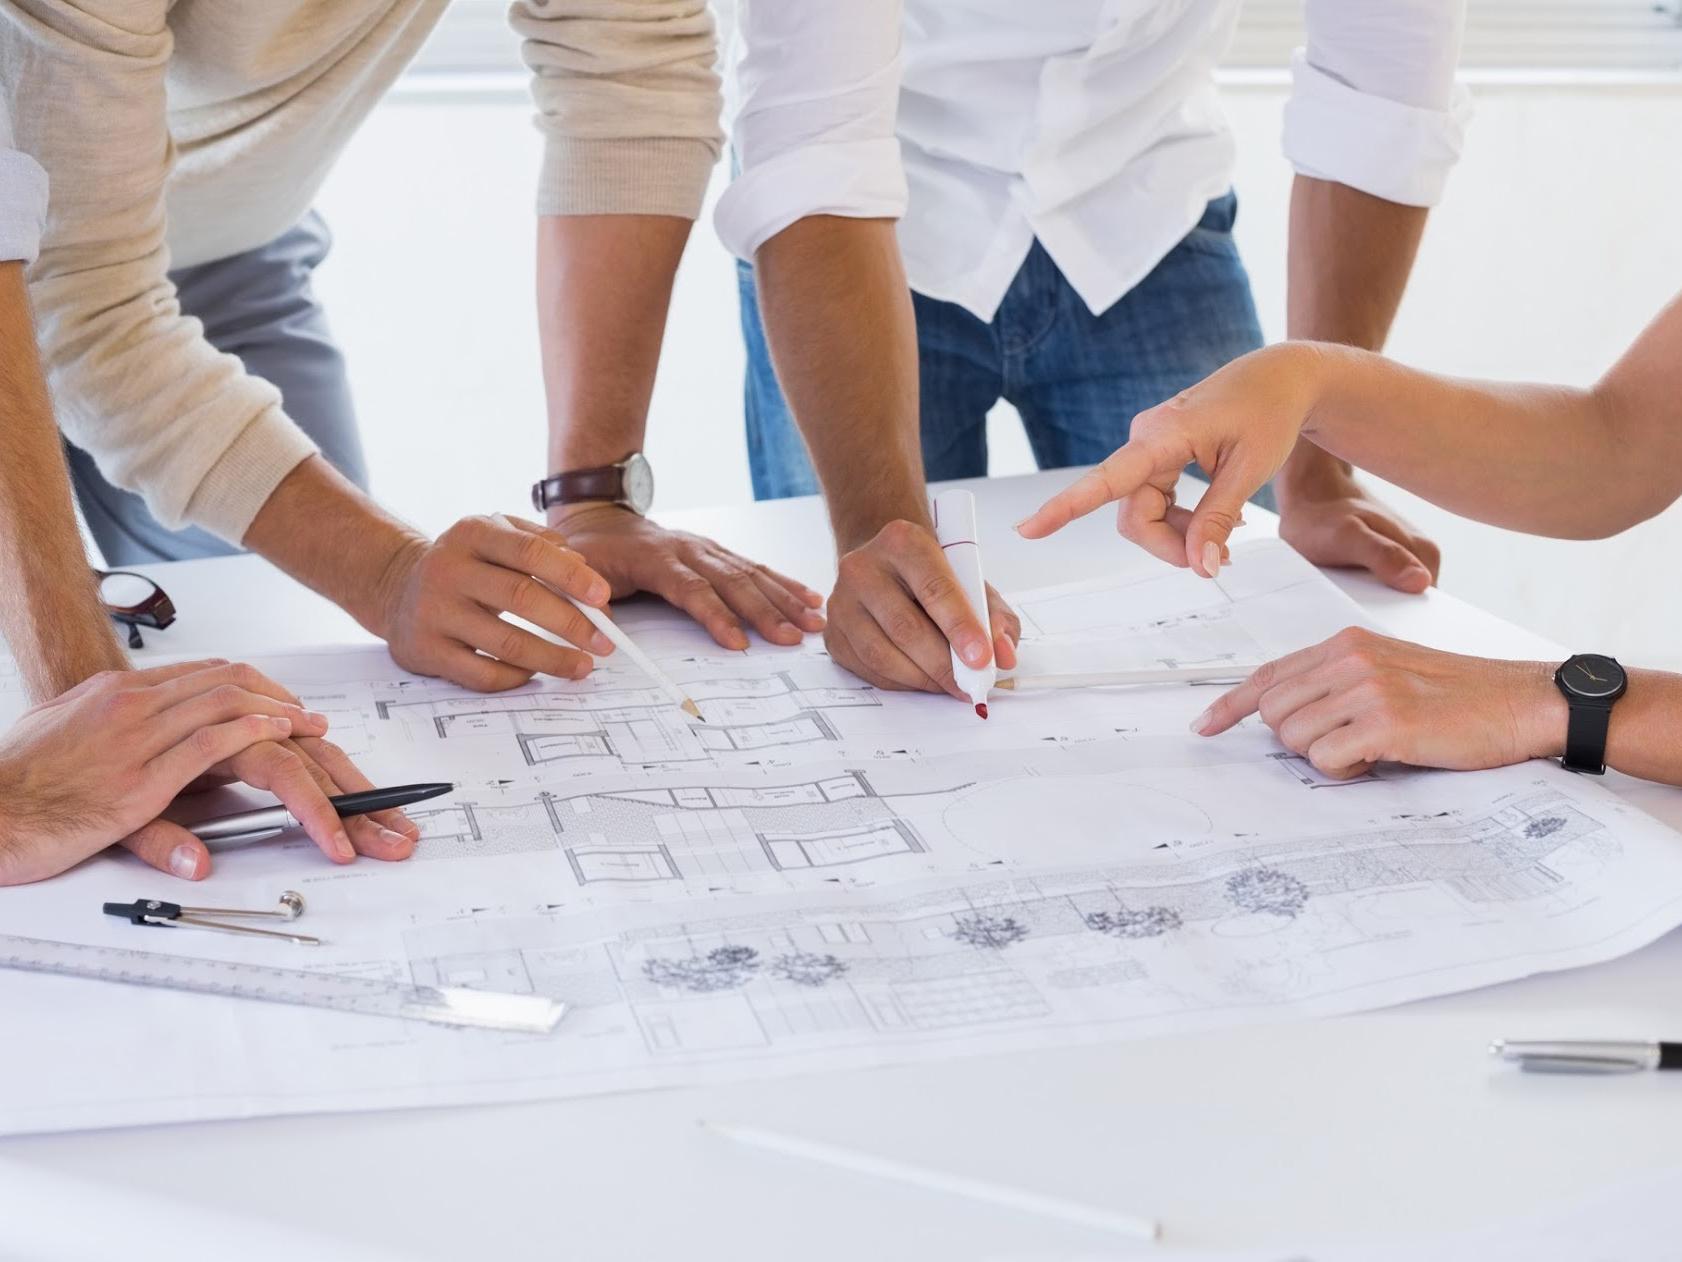 Designing The Future   Education in Architecture